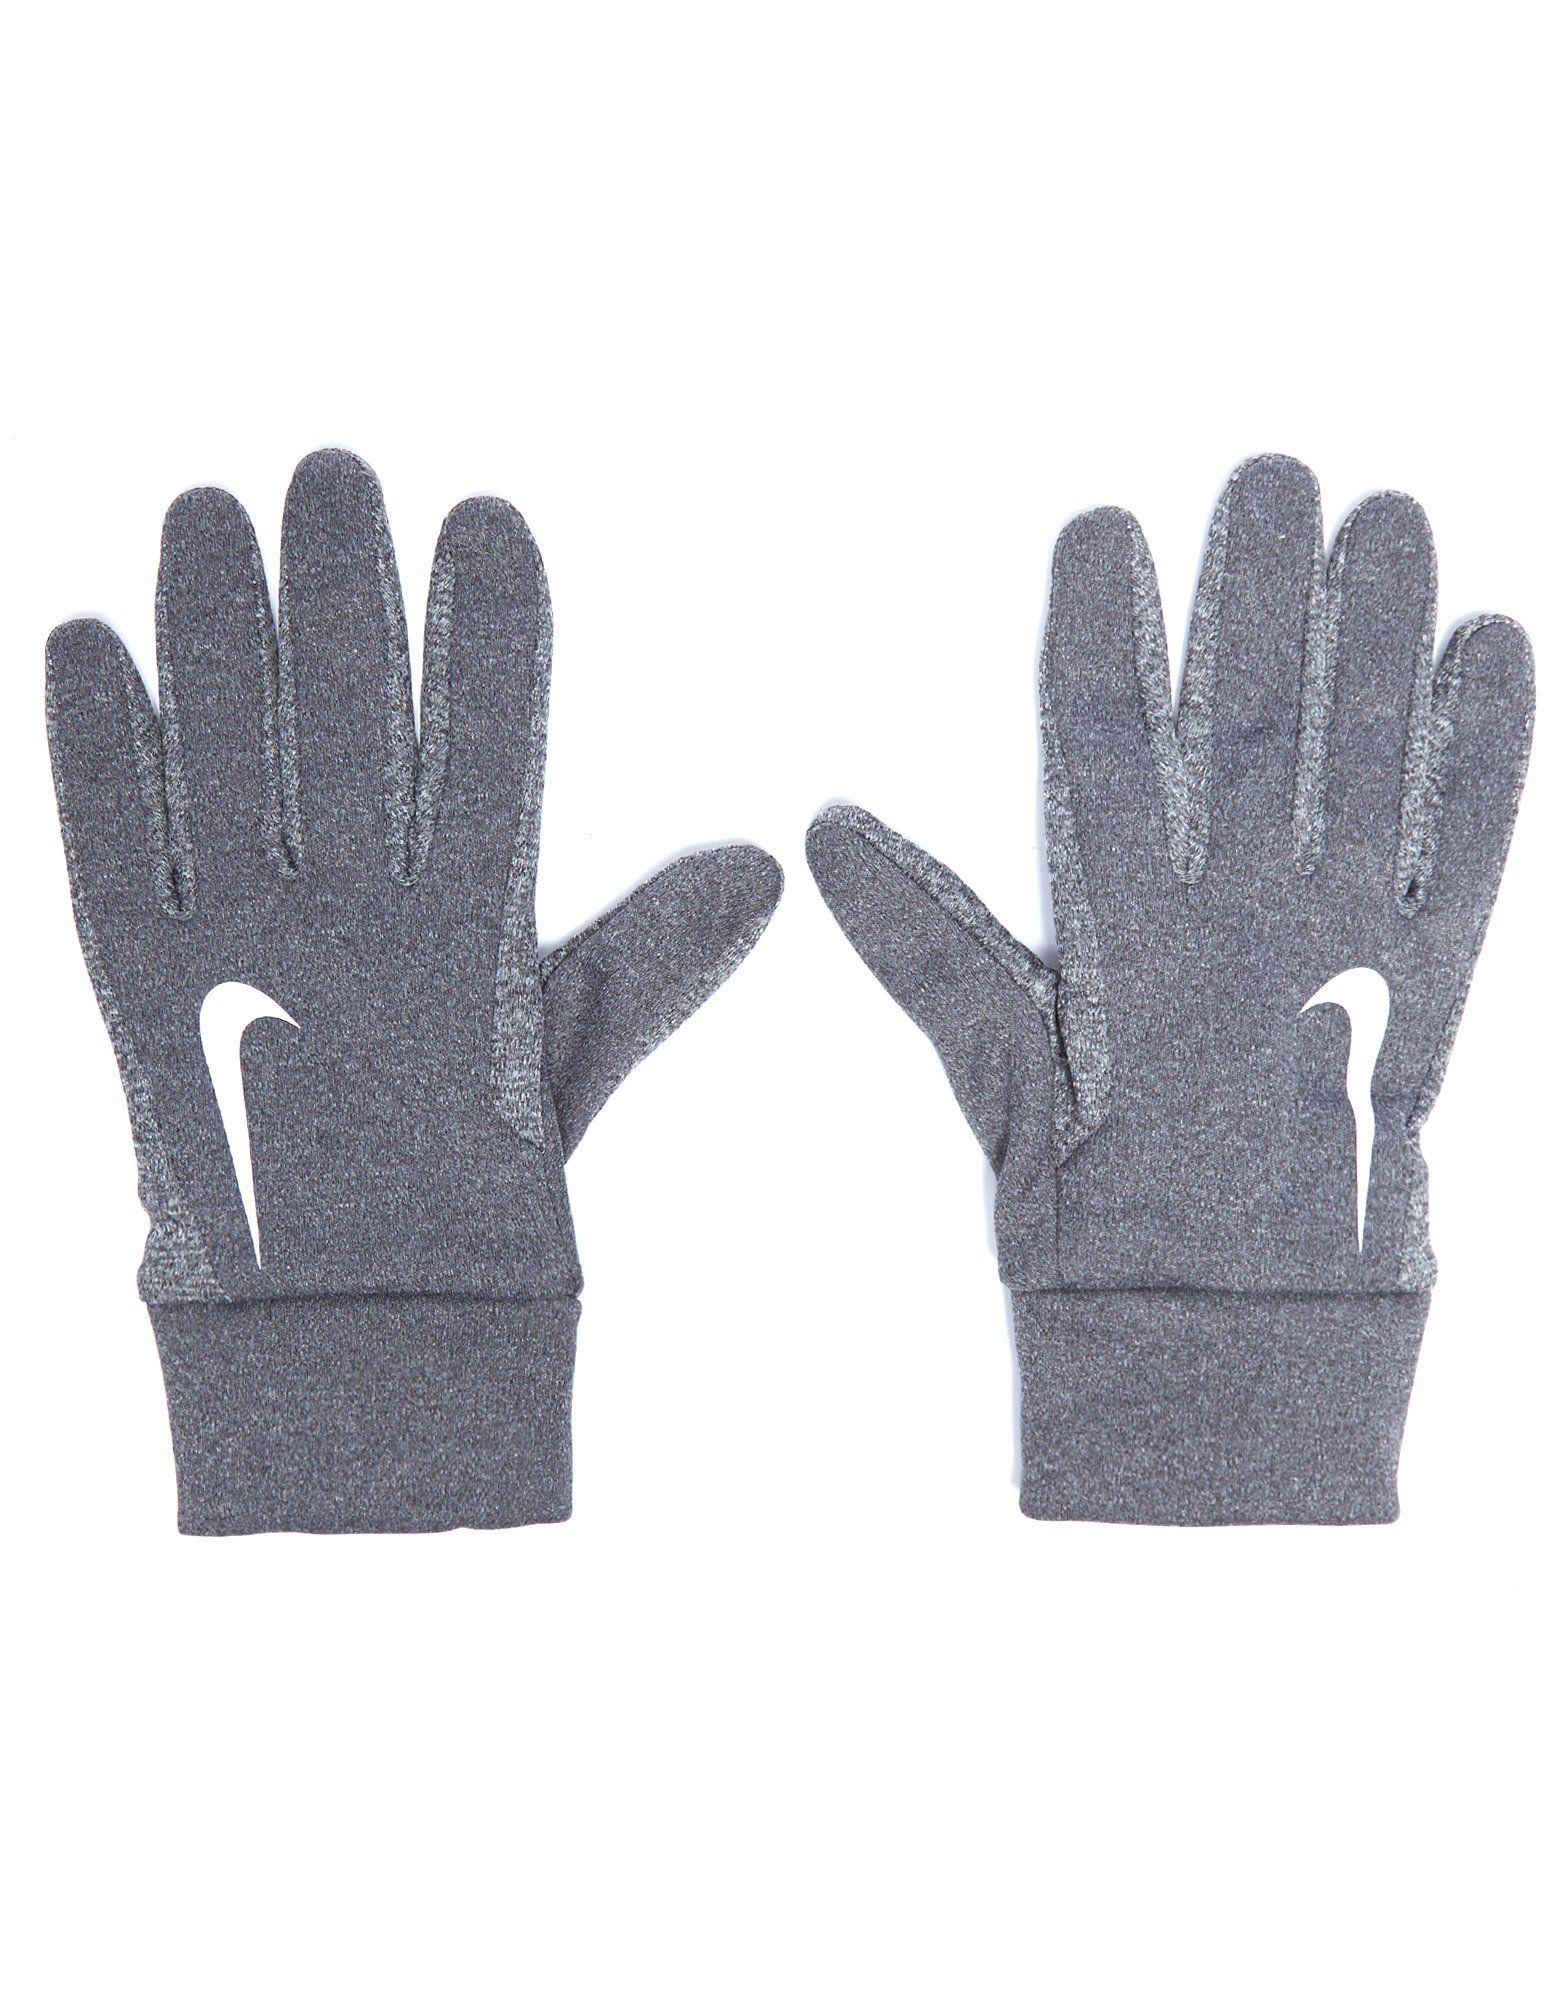 Mens gloves sale uk - Nike Hyperwarm Field Player Gloves